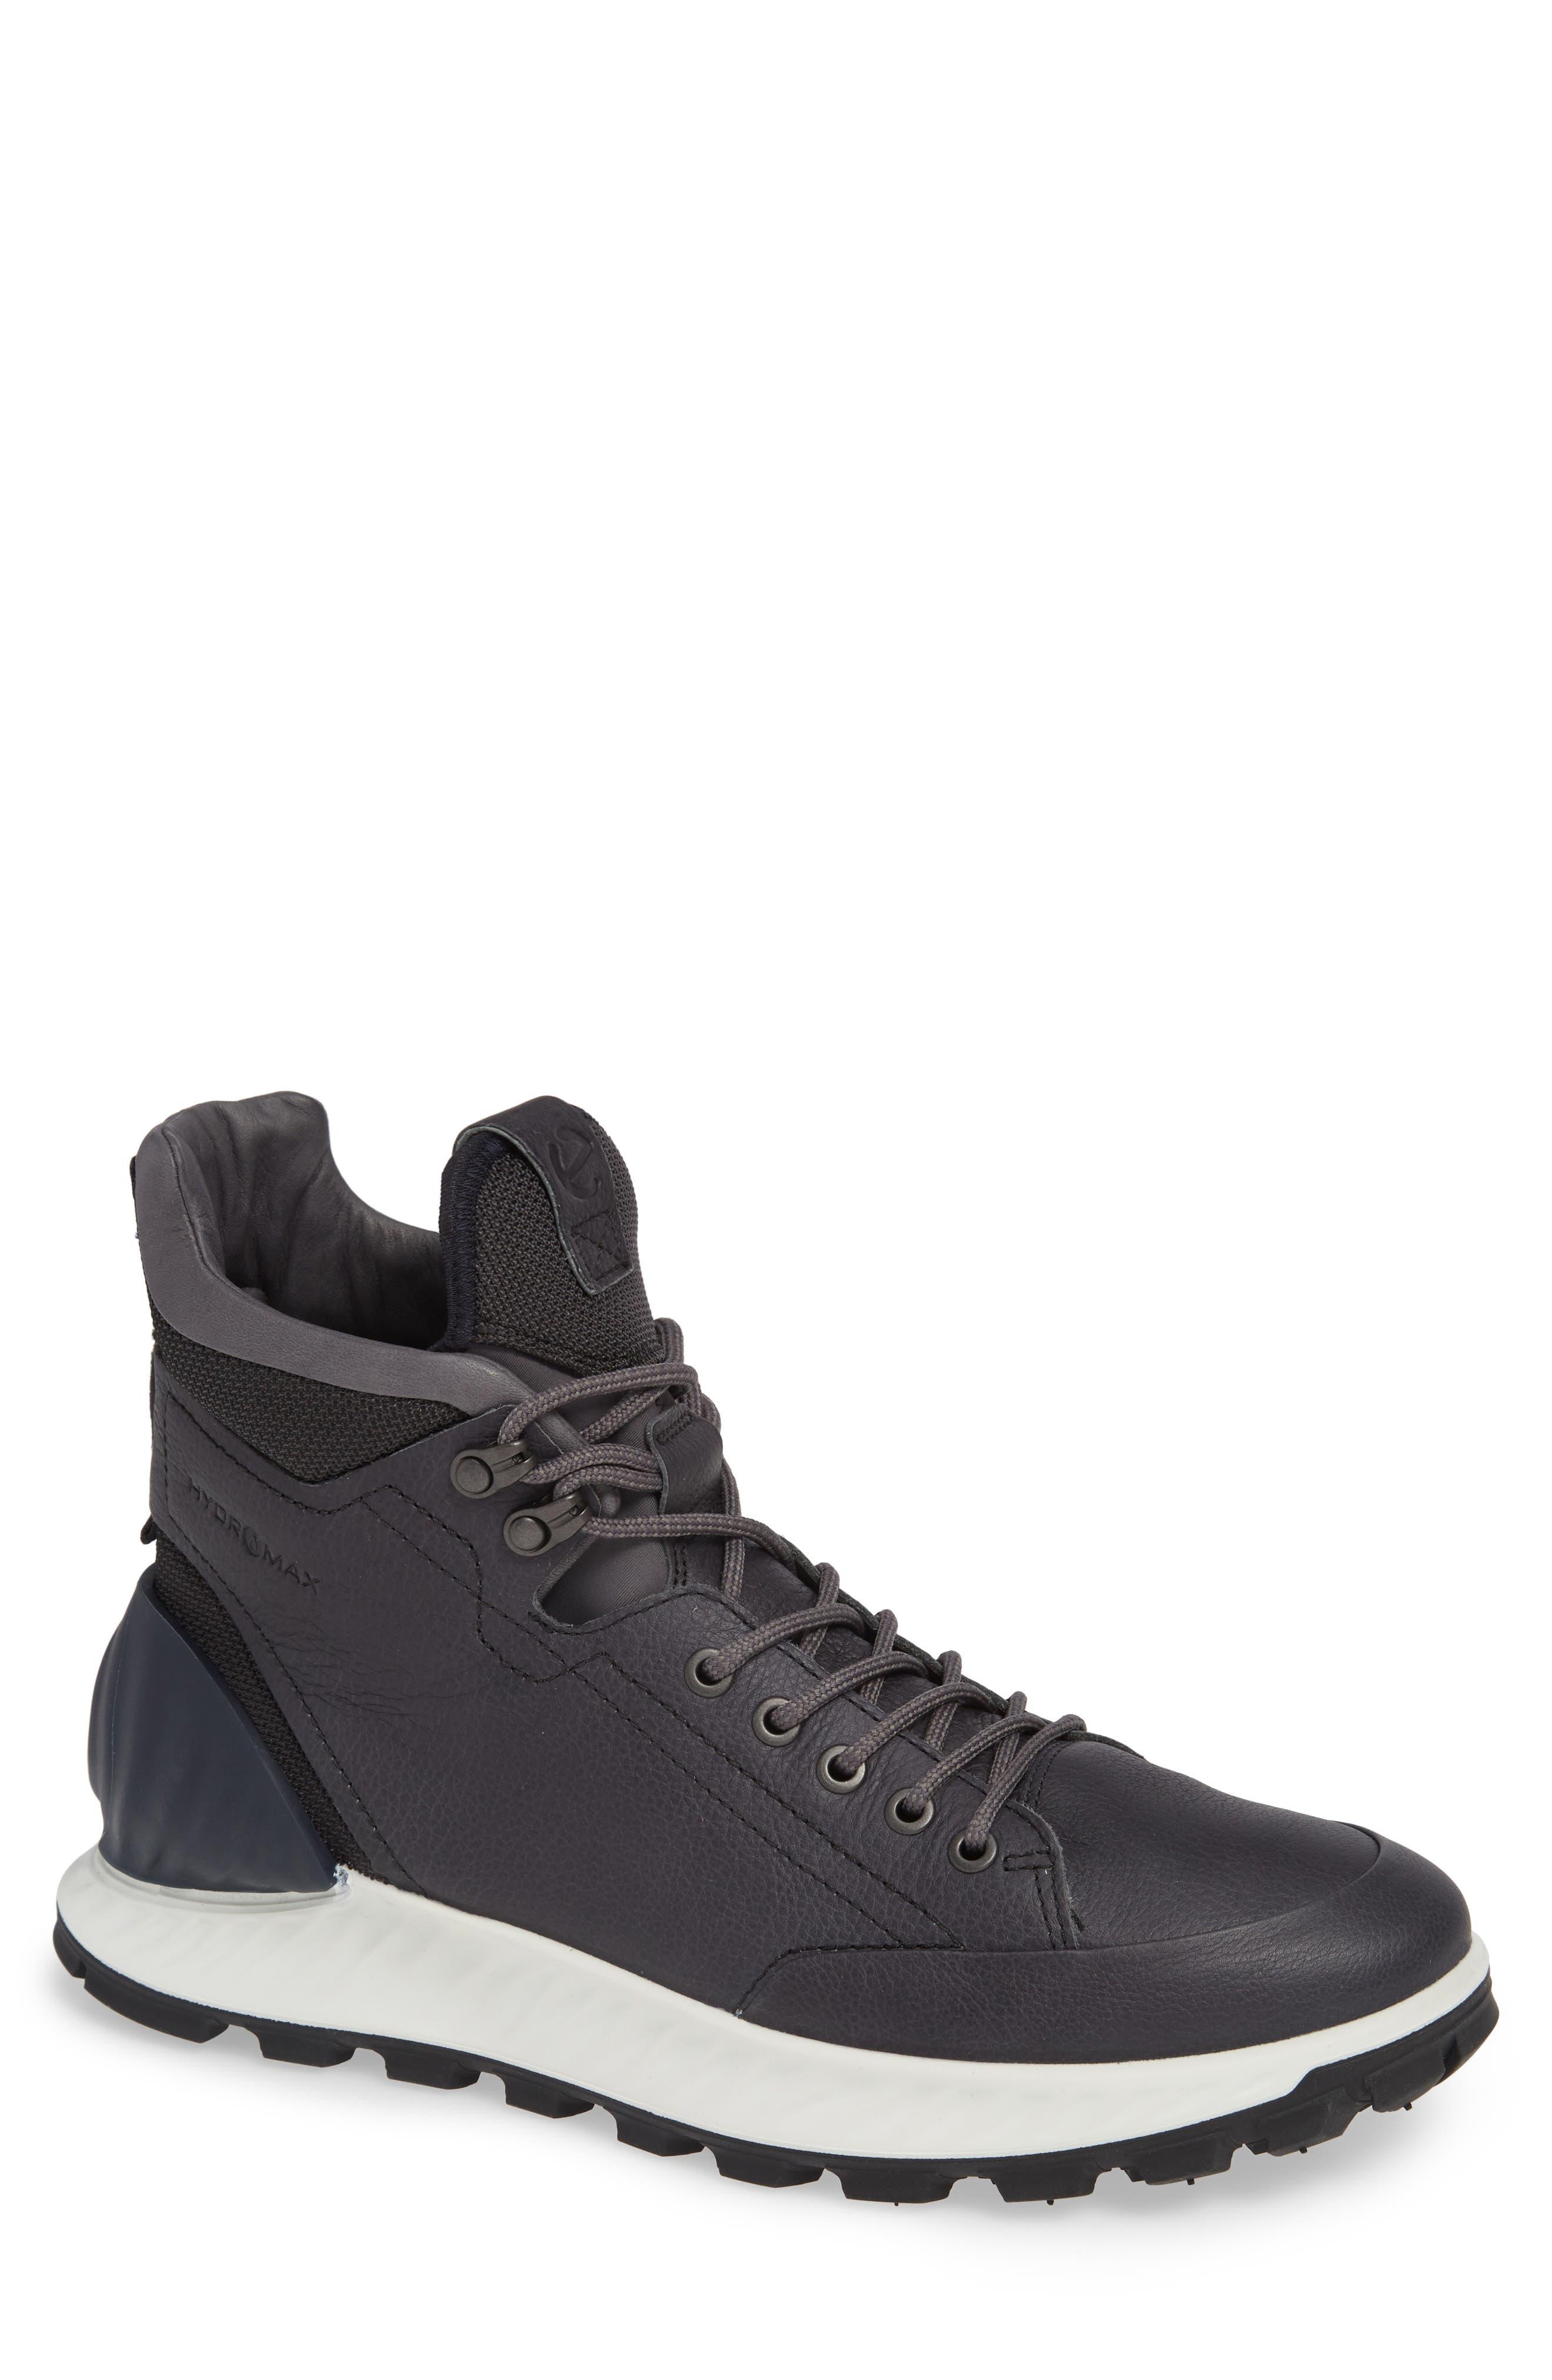 Ecco Exostrike Hydromax Boot, Grey